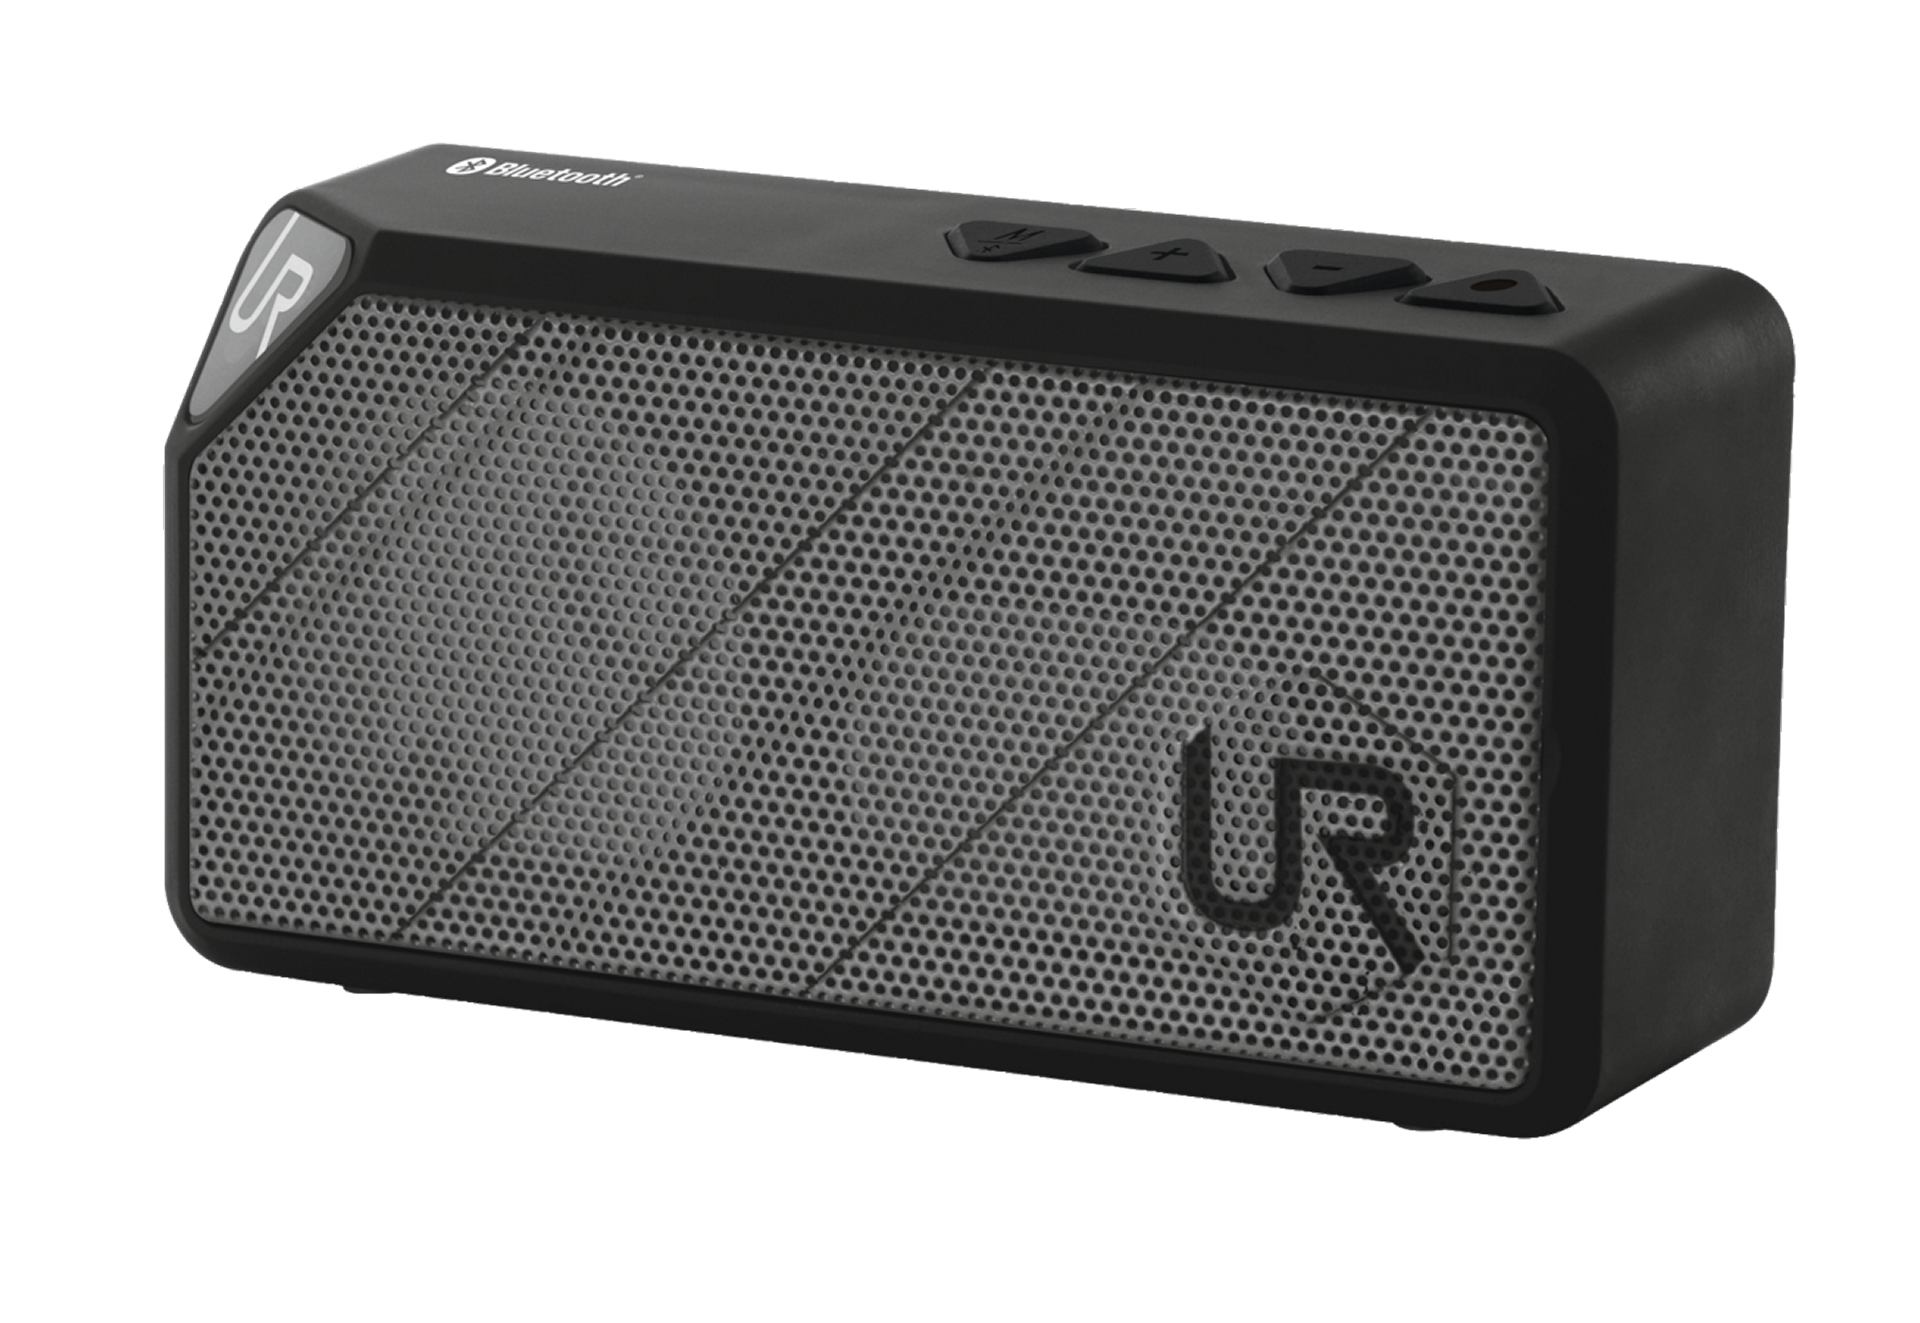 URBAN REVOLT (by Trust) Bezdrátový reproduktor YZO Wireless Speaker, šedý